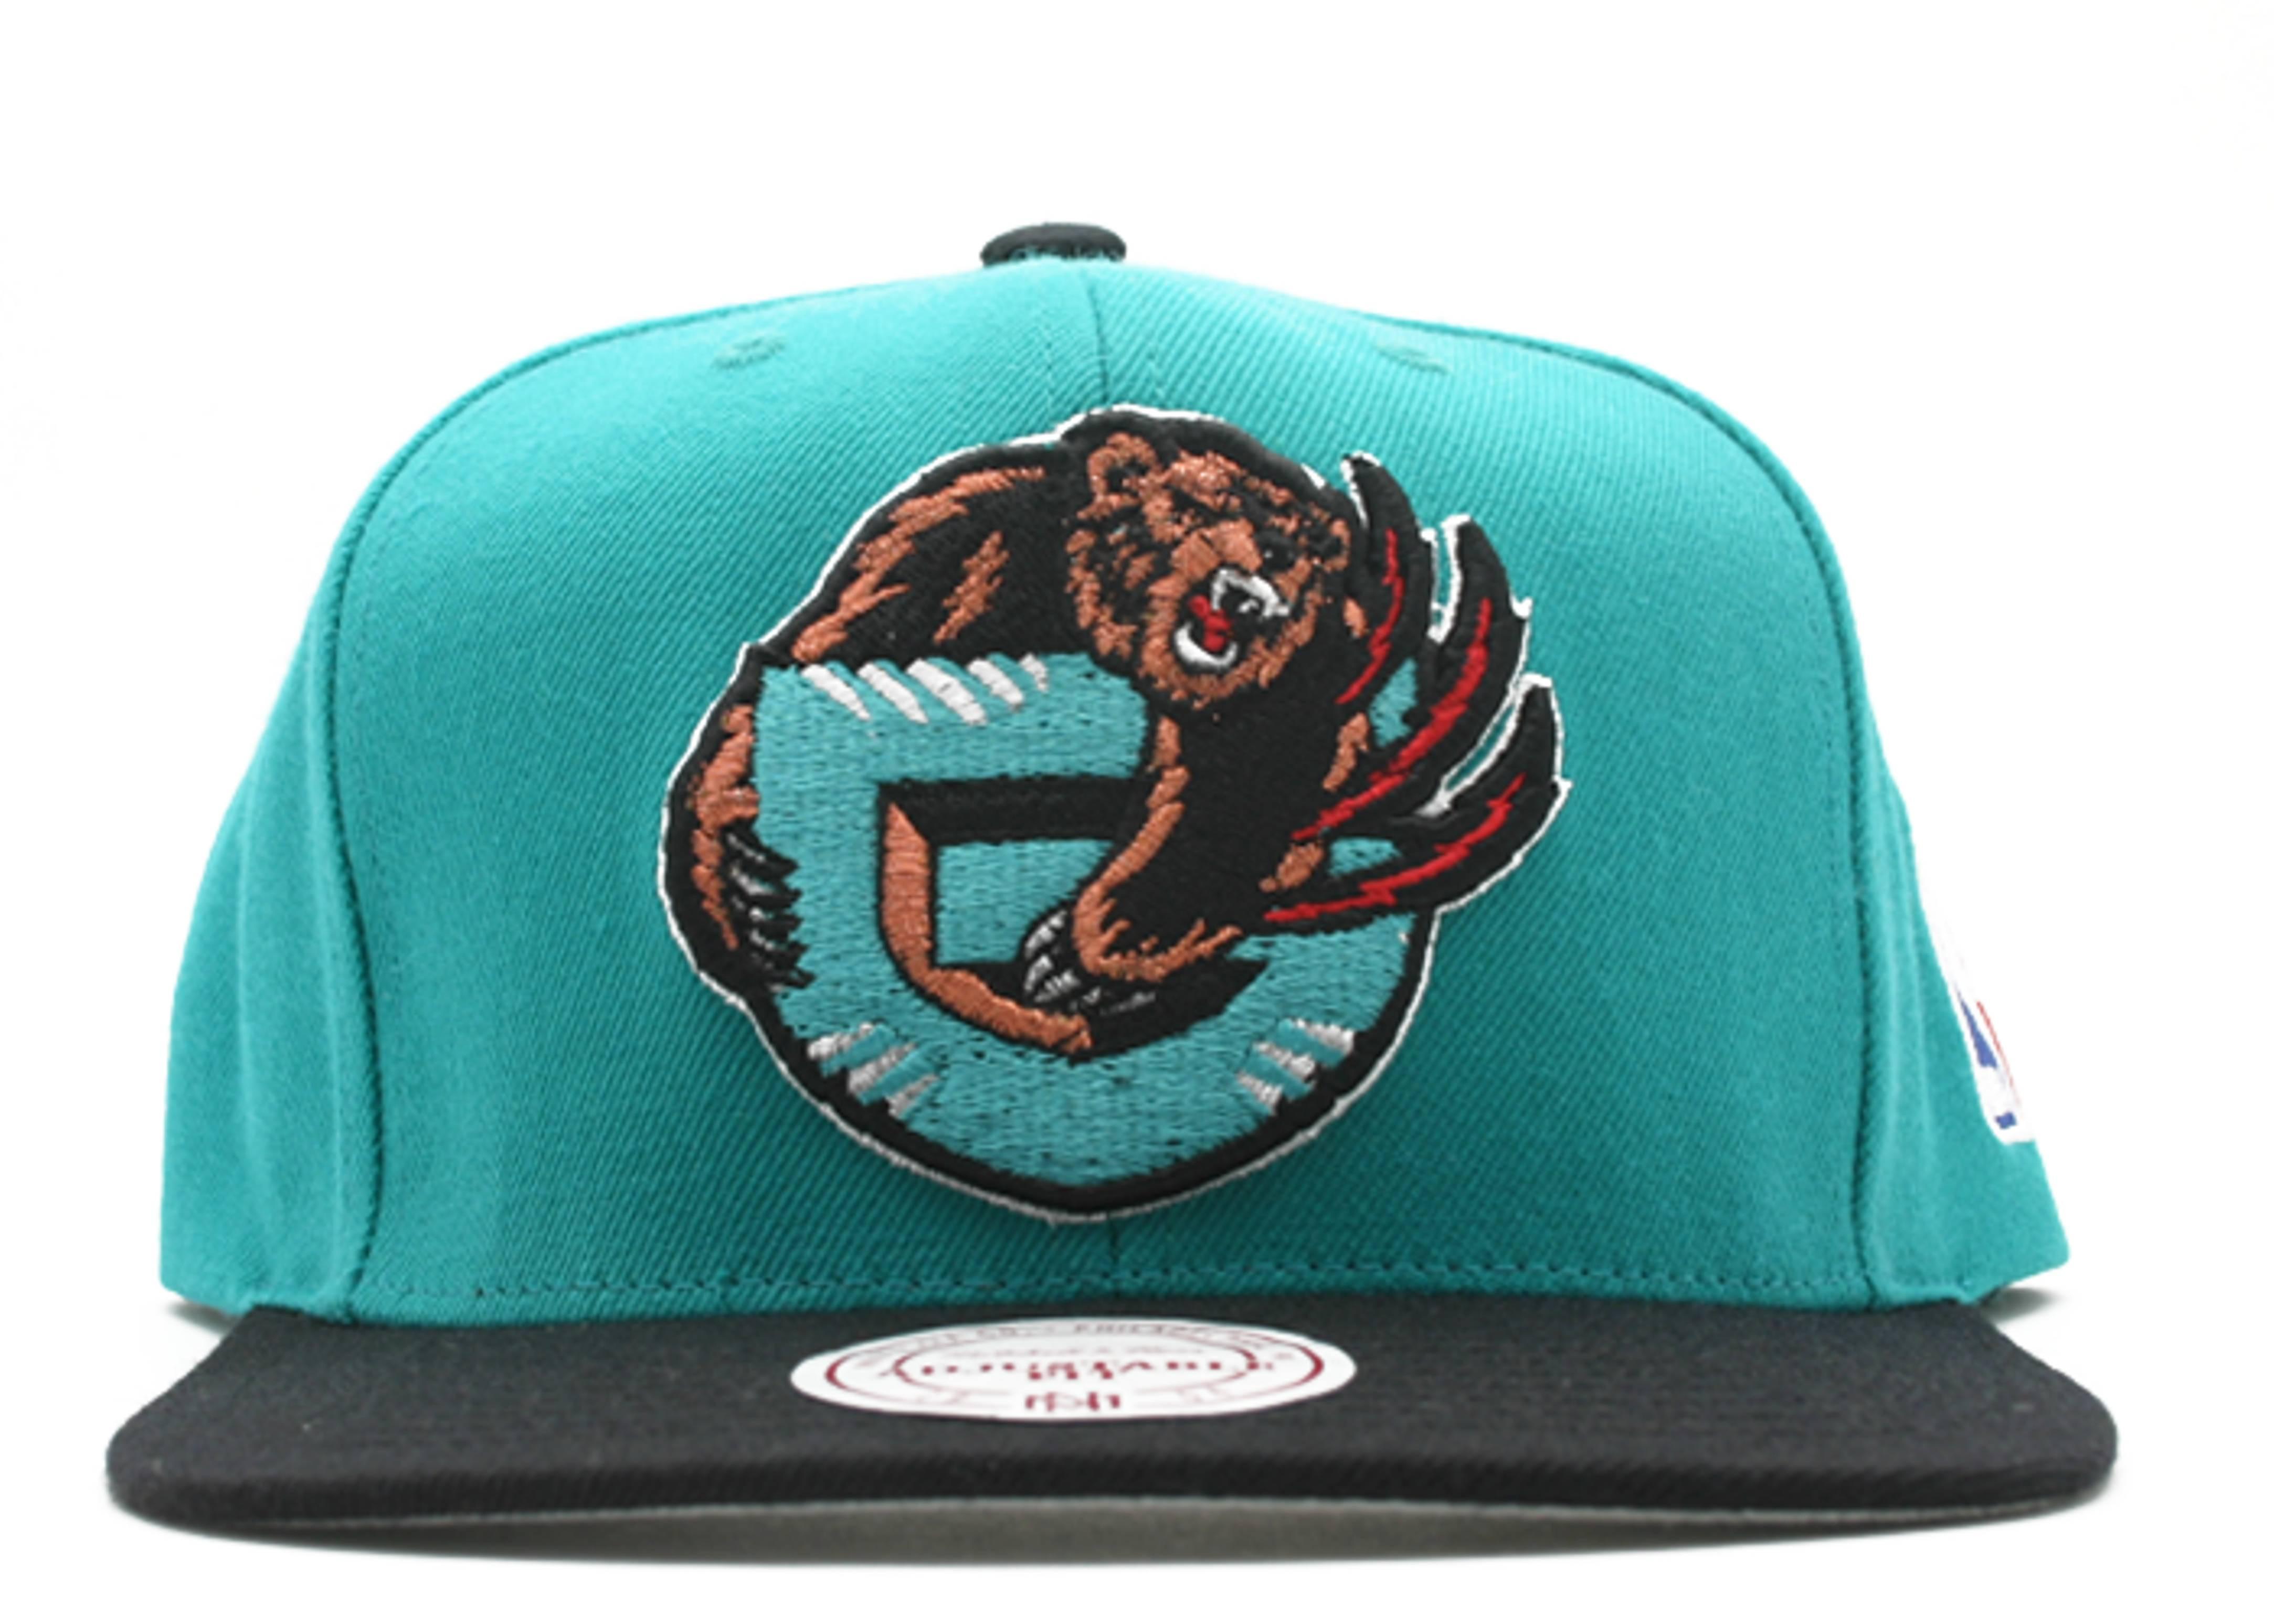 vancouver grizzlies snap-back